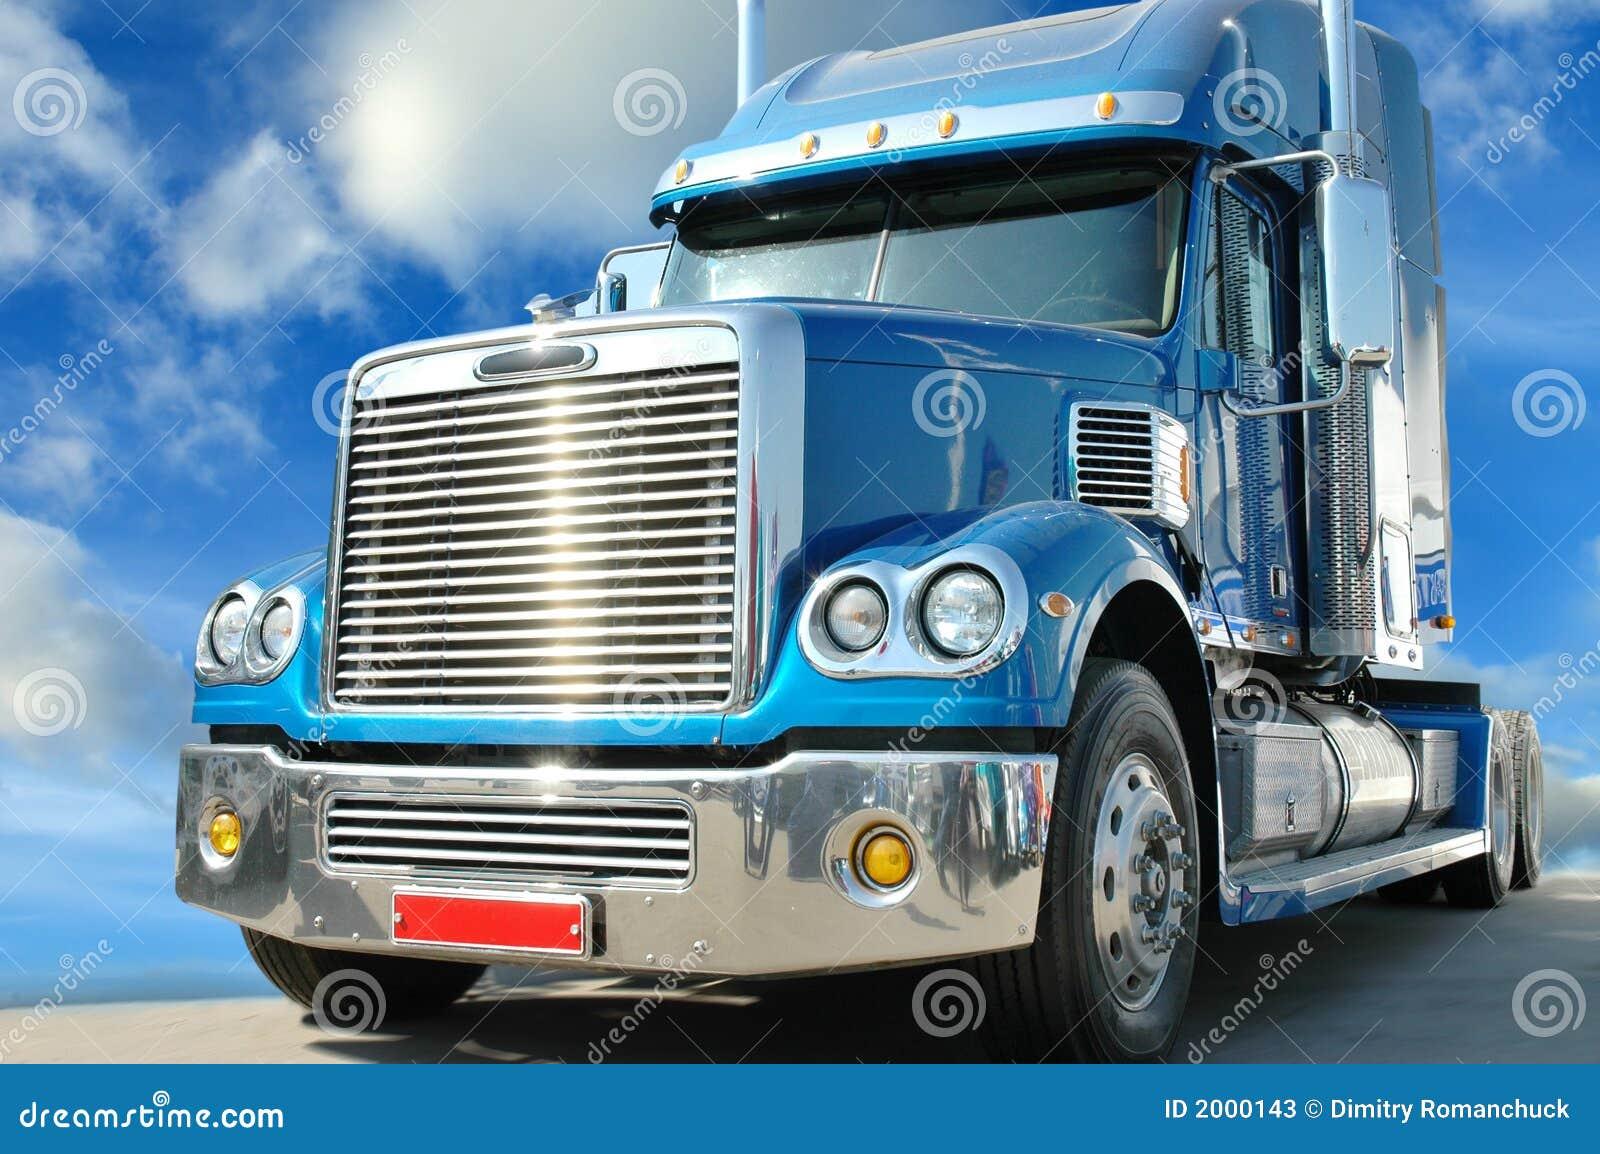 highway star american truck stock image image 2000143. Black Bedroom Furniture Sets. Home Design Ideas